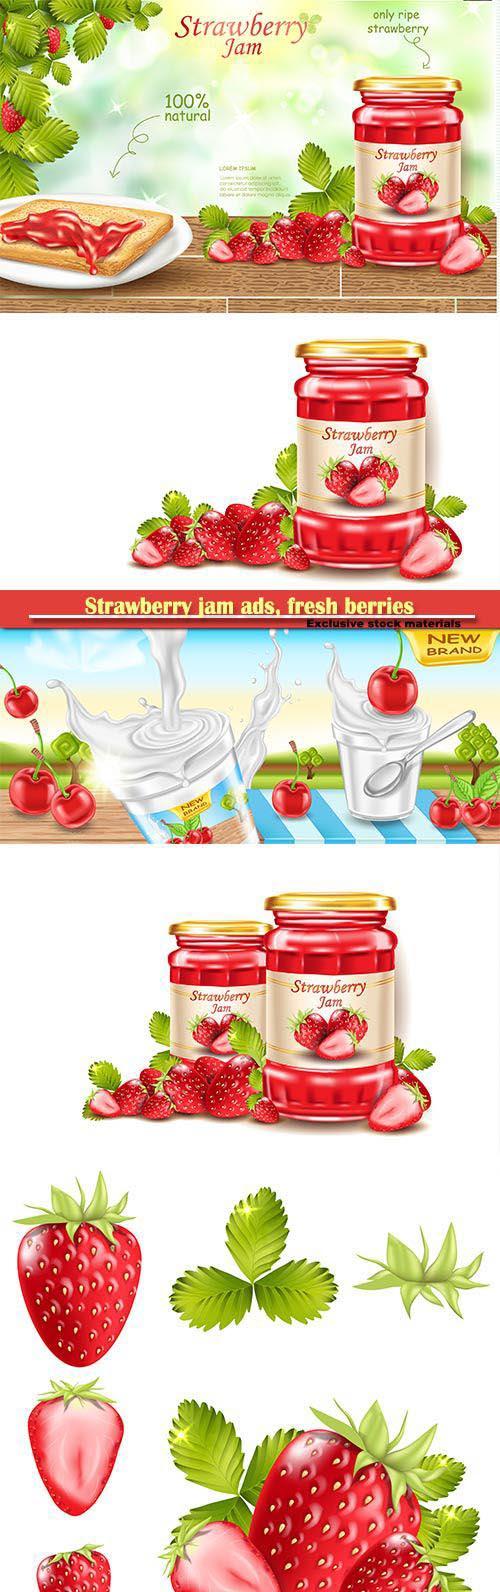 Strawberry jam ads, fresh berries realistic 3d illustration